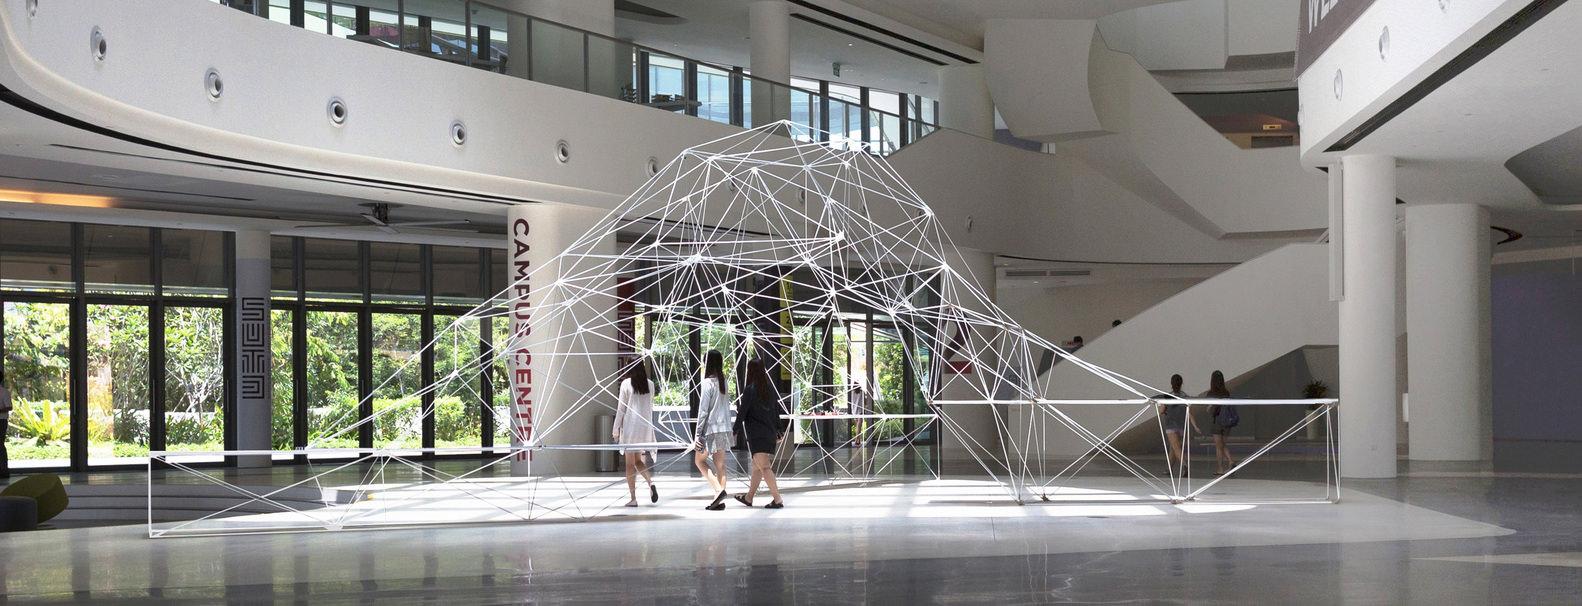 SUTD-3D-Printed-Mesh-Pavilion-4